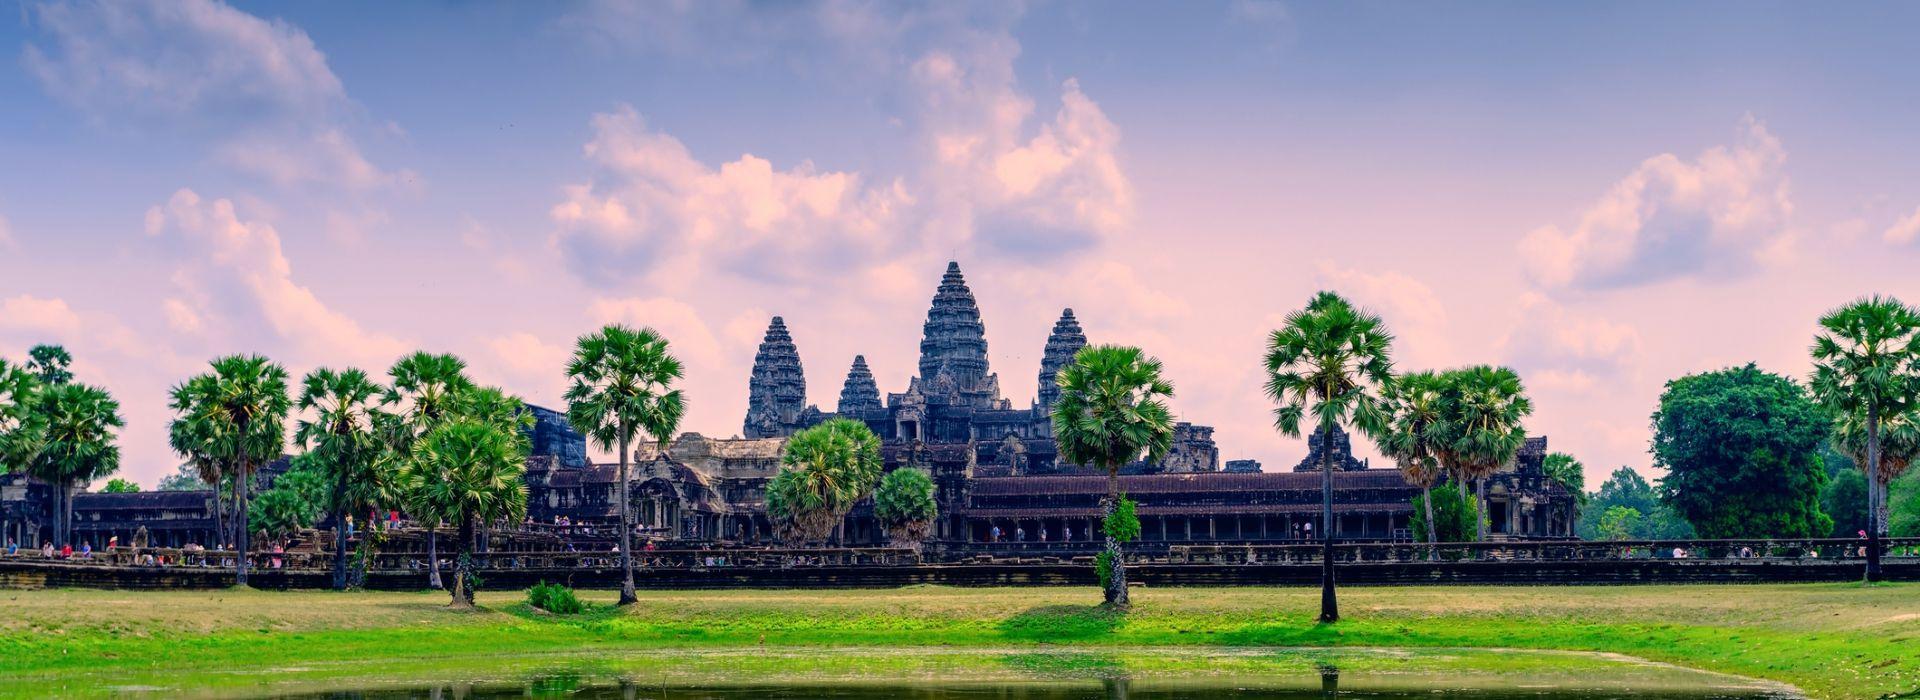 Food tours in Siem Reap